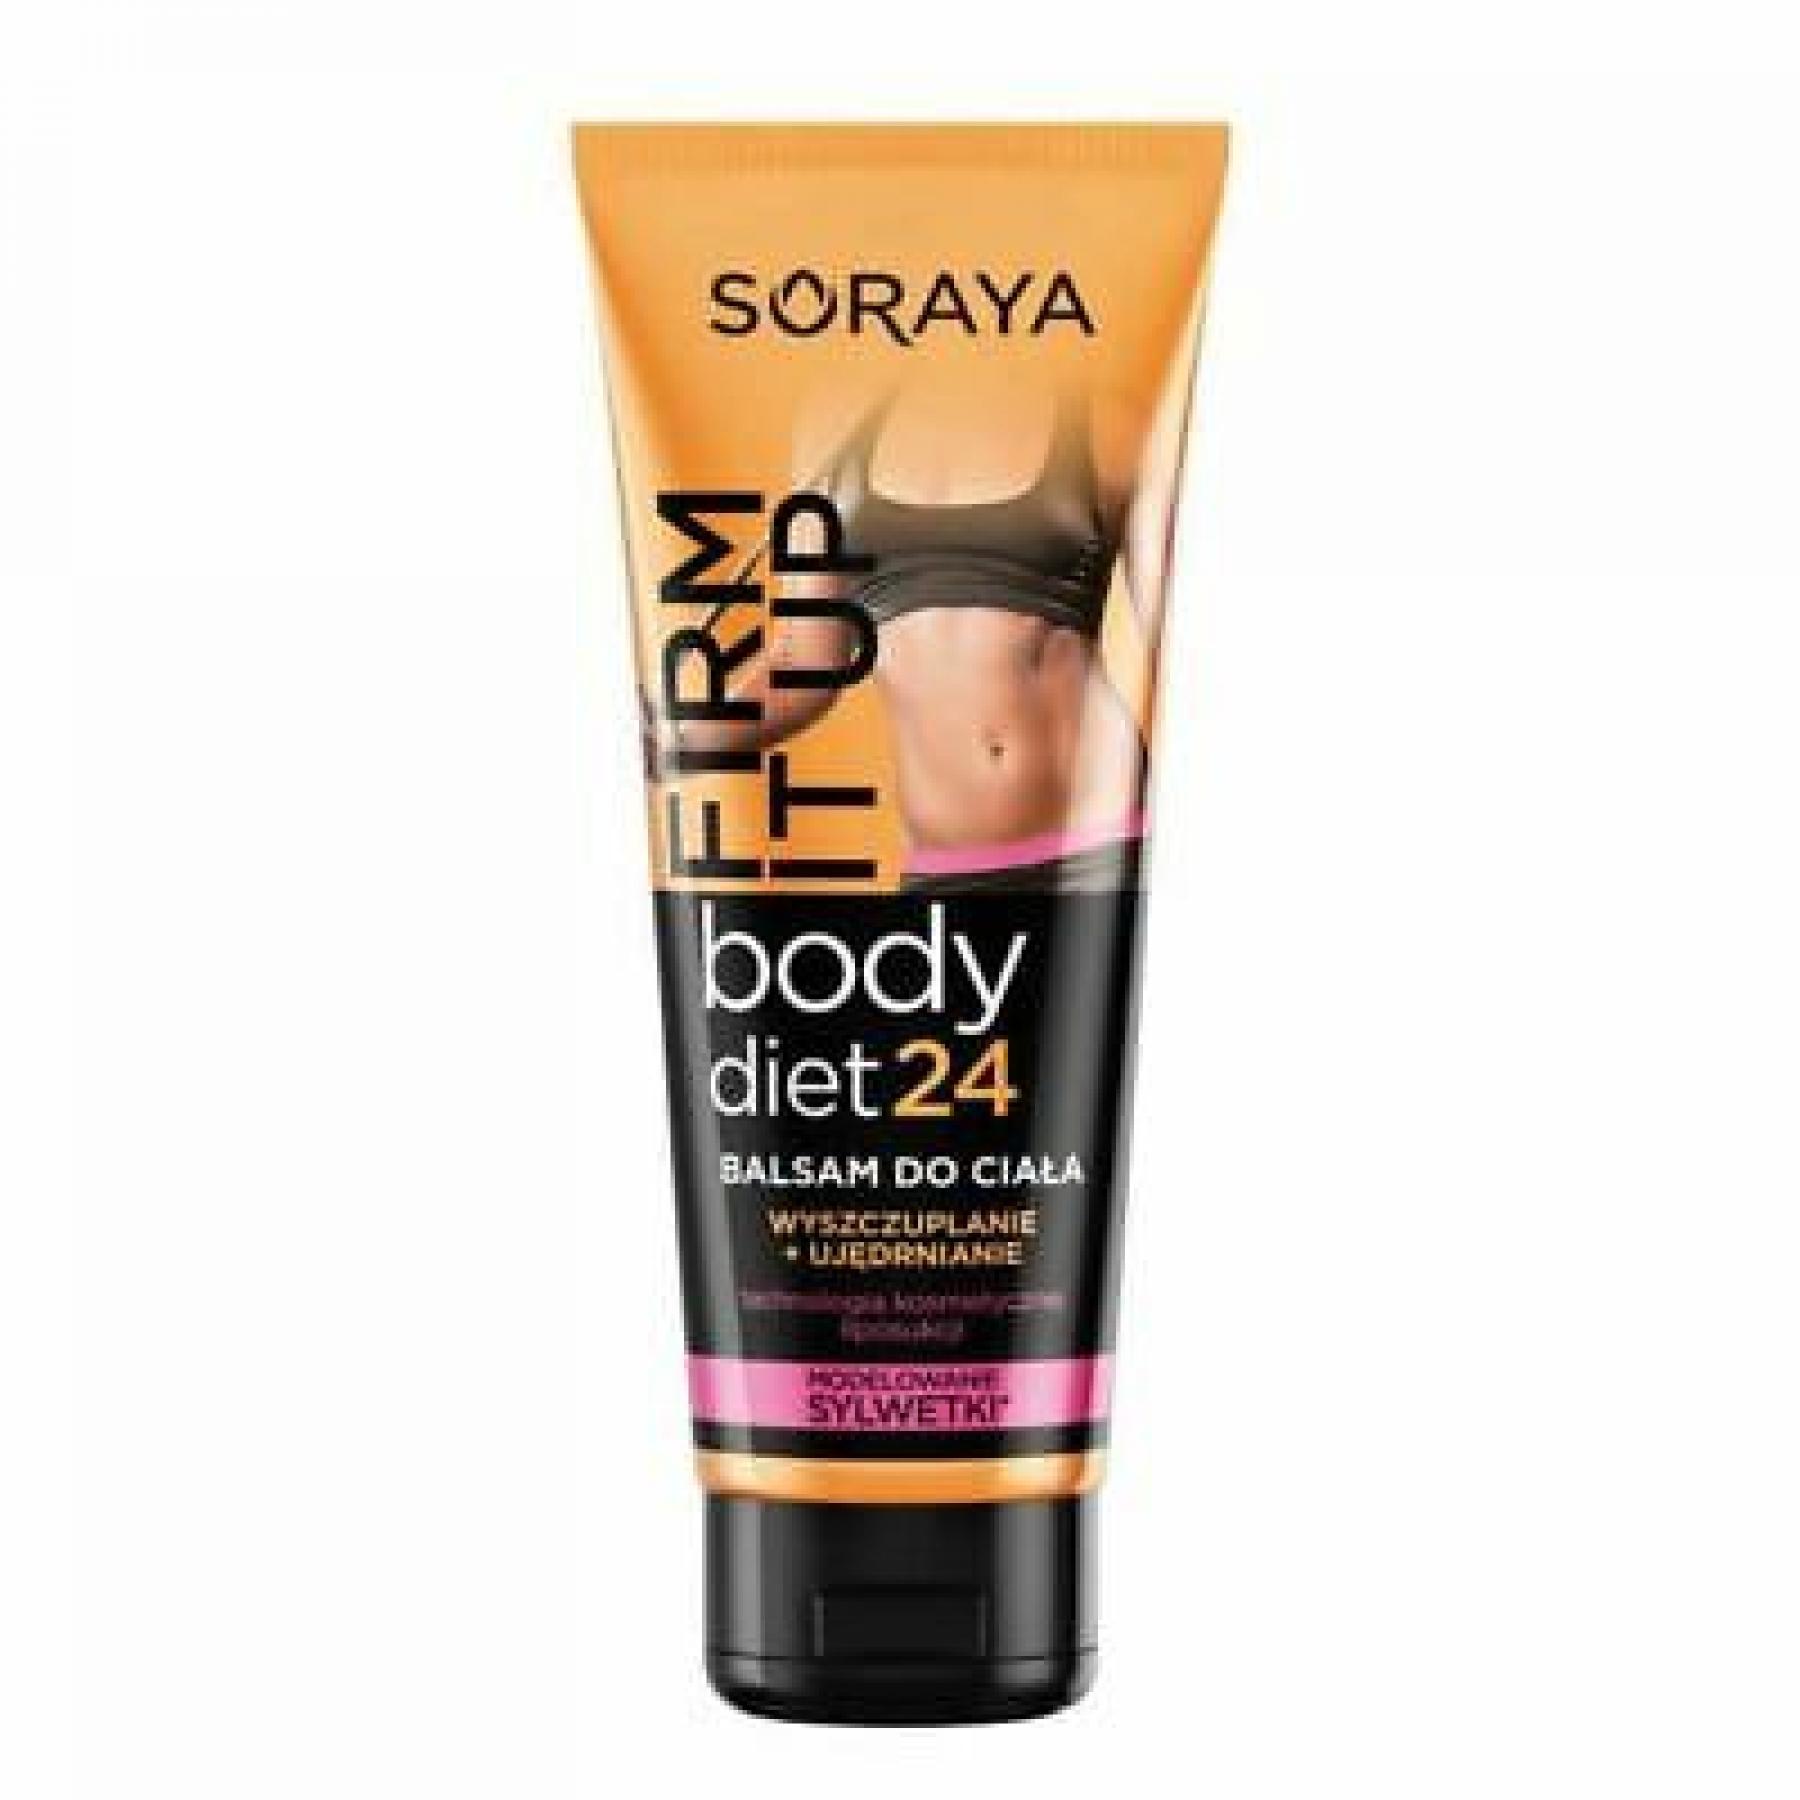 Body Diet 24 - Slimming - Firming 200ml